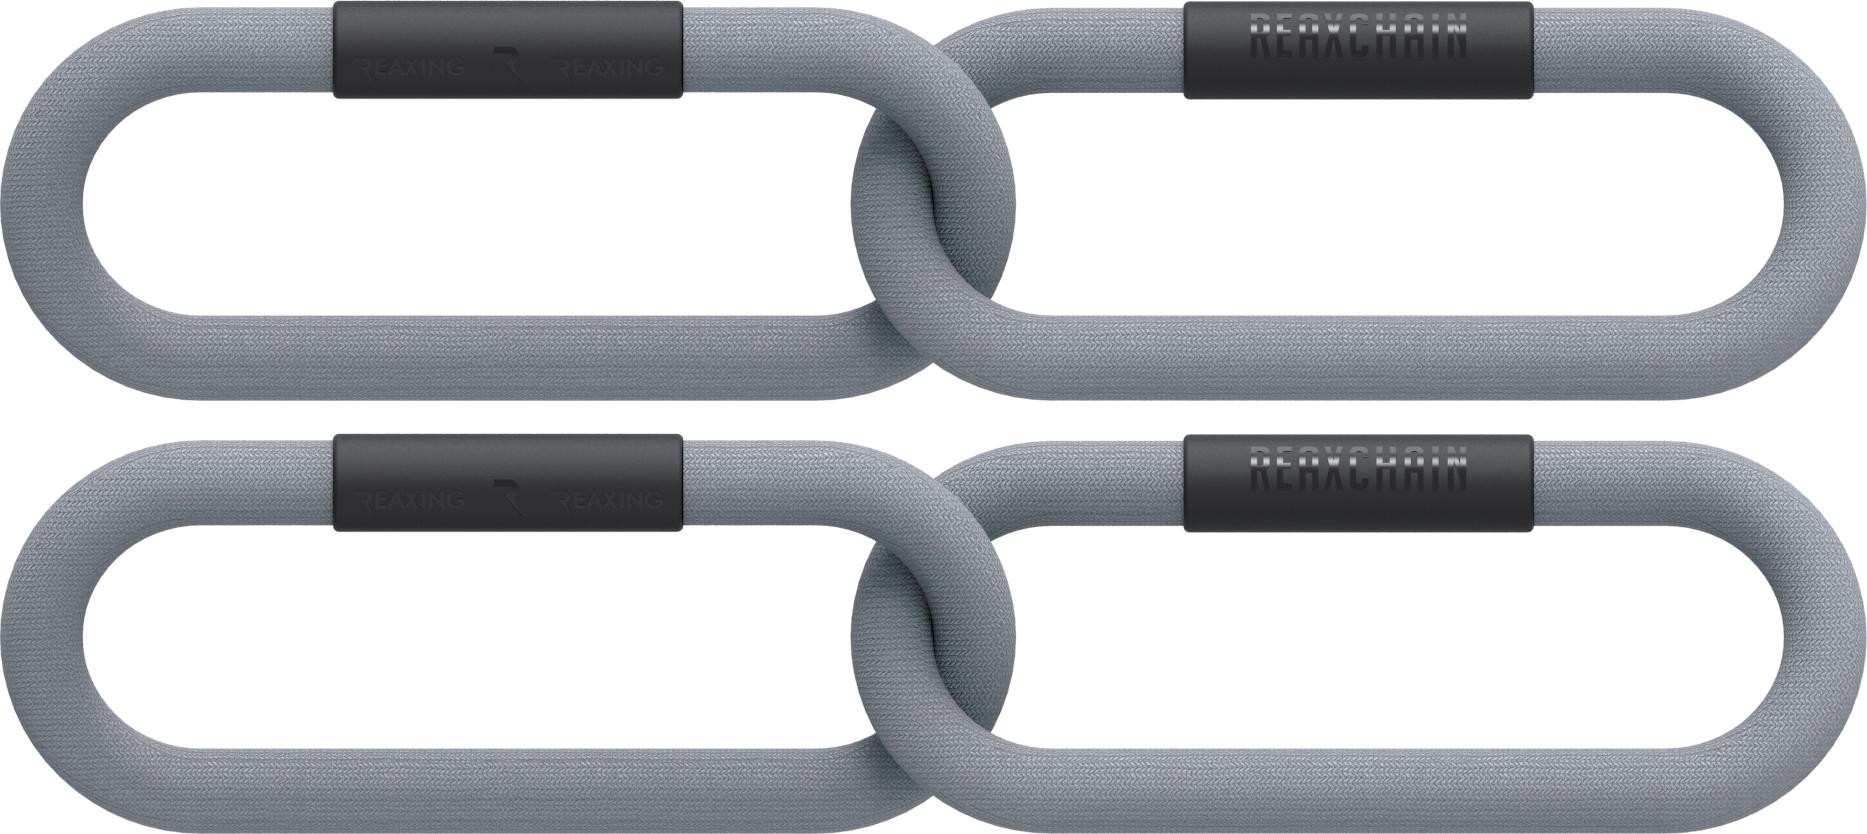 Lancuch treningowy Reax Chain TWO 1 kg - kolor szary